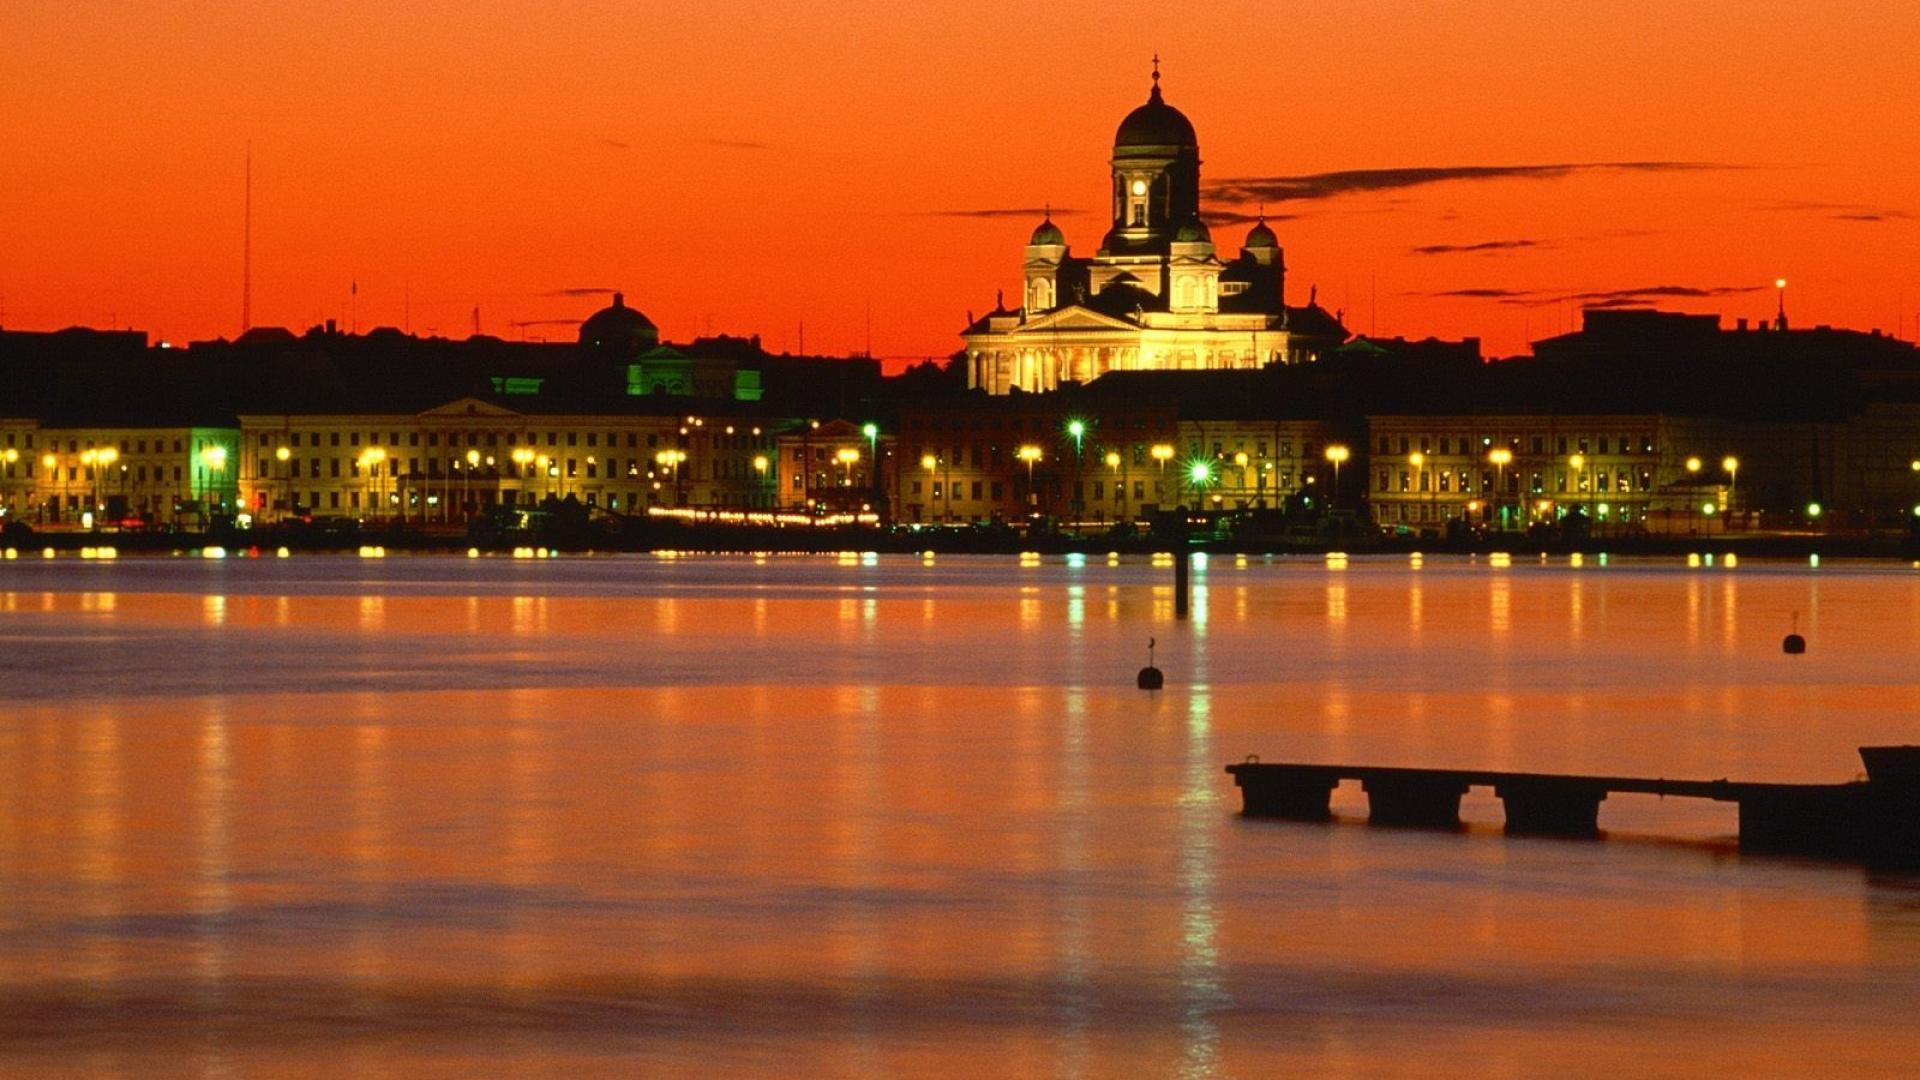 orange finland helsinki twilight time of day wallpaper 17797 1920x1080